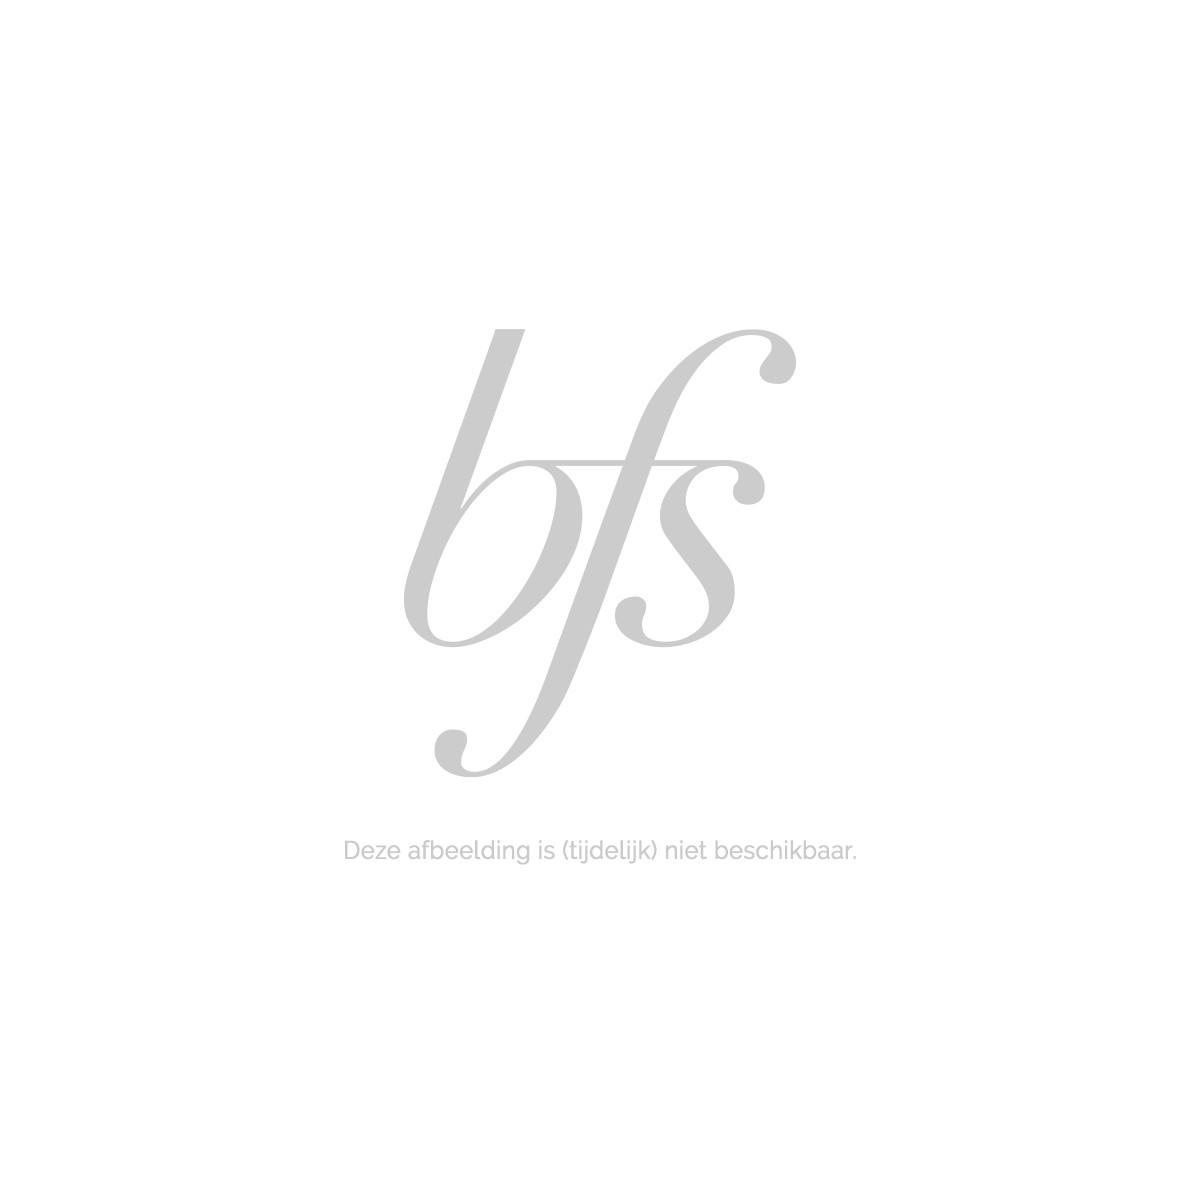 Givenchy Pi Eau De Toilette Spray Oversize 150 Ml